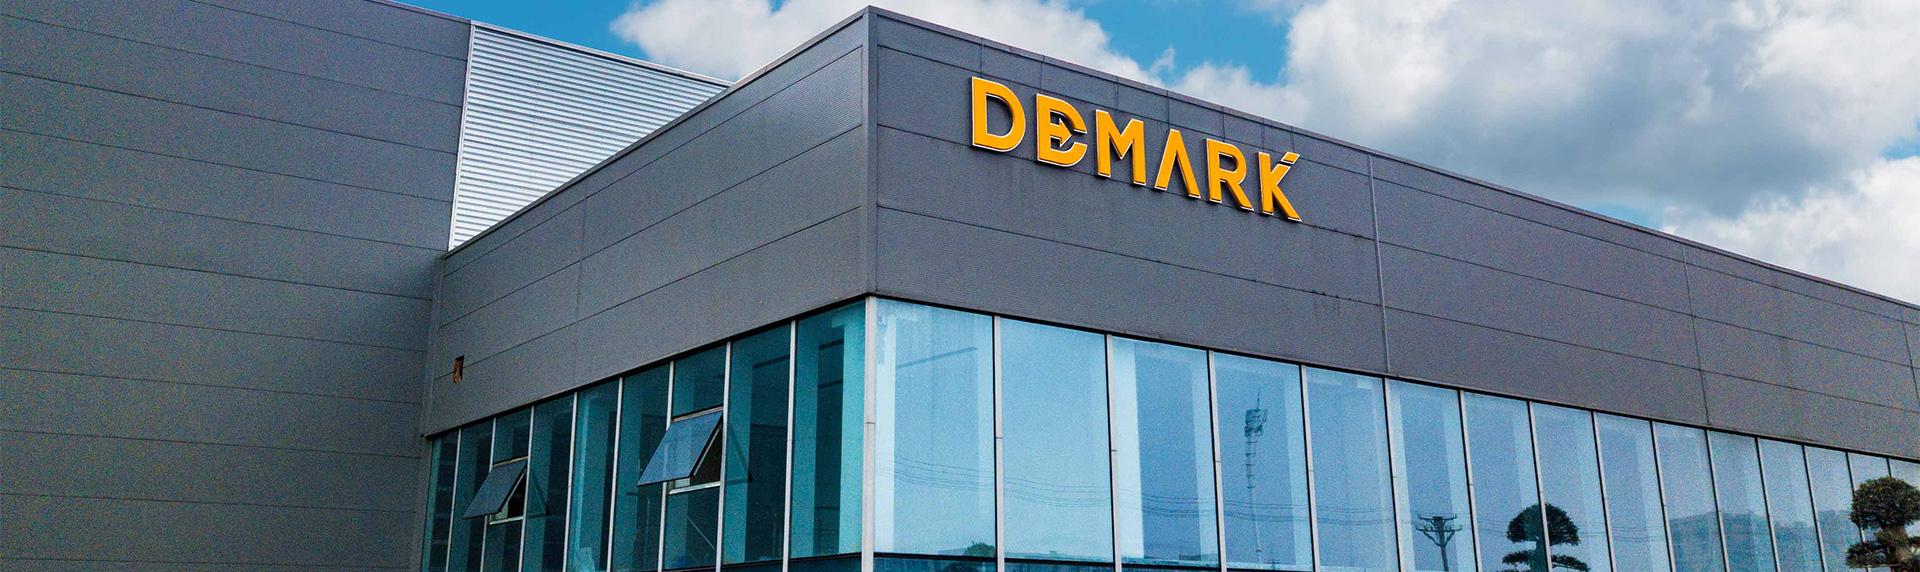 UJC设计-德玛克新厂区导视系统设计